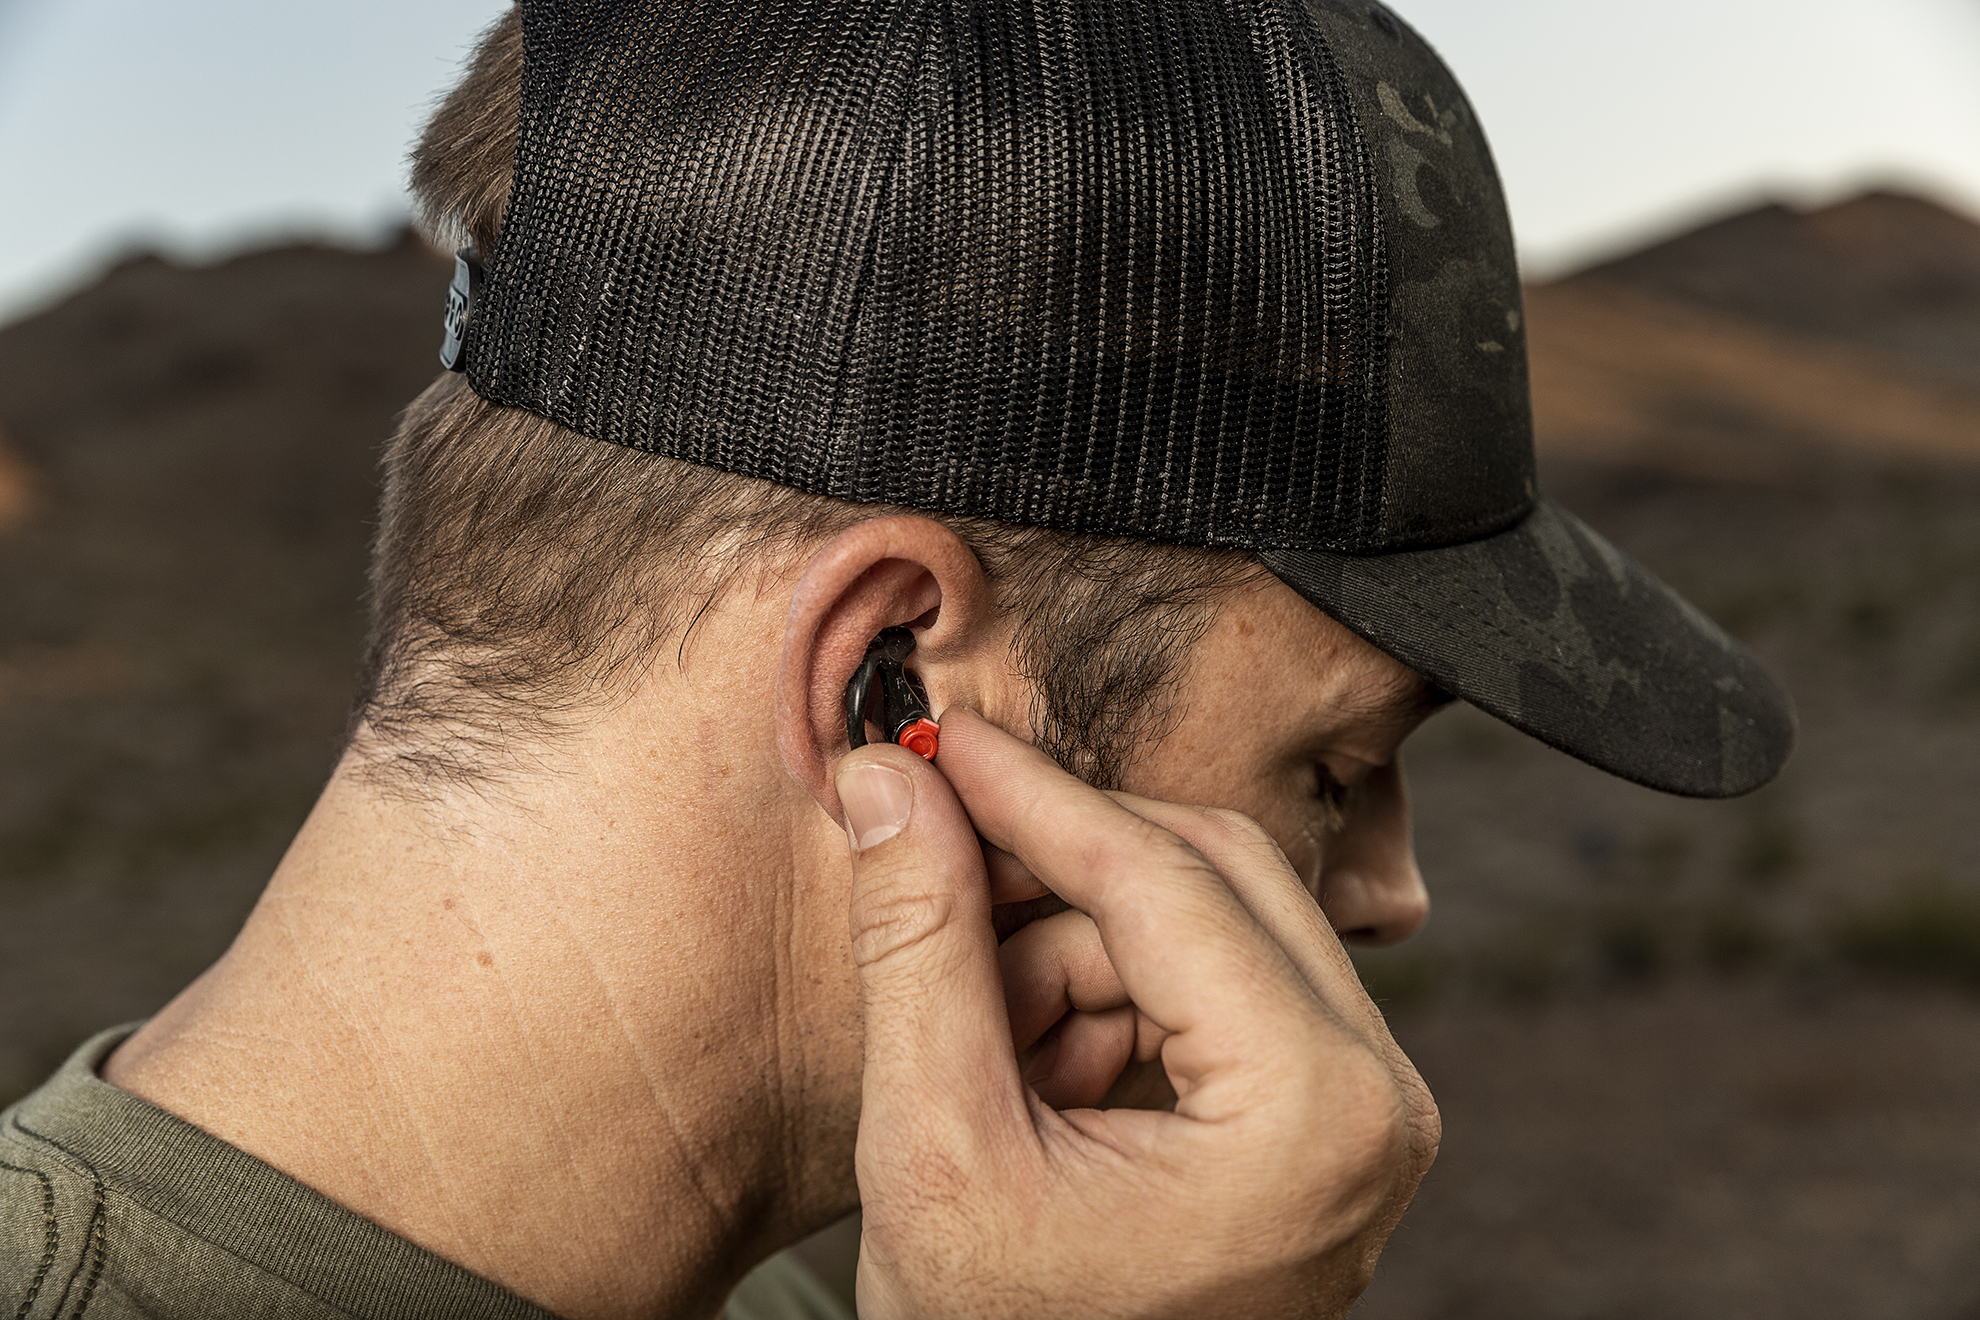 SureFire EarPro features patented EarLock design